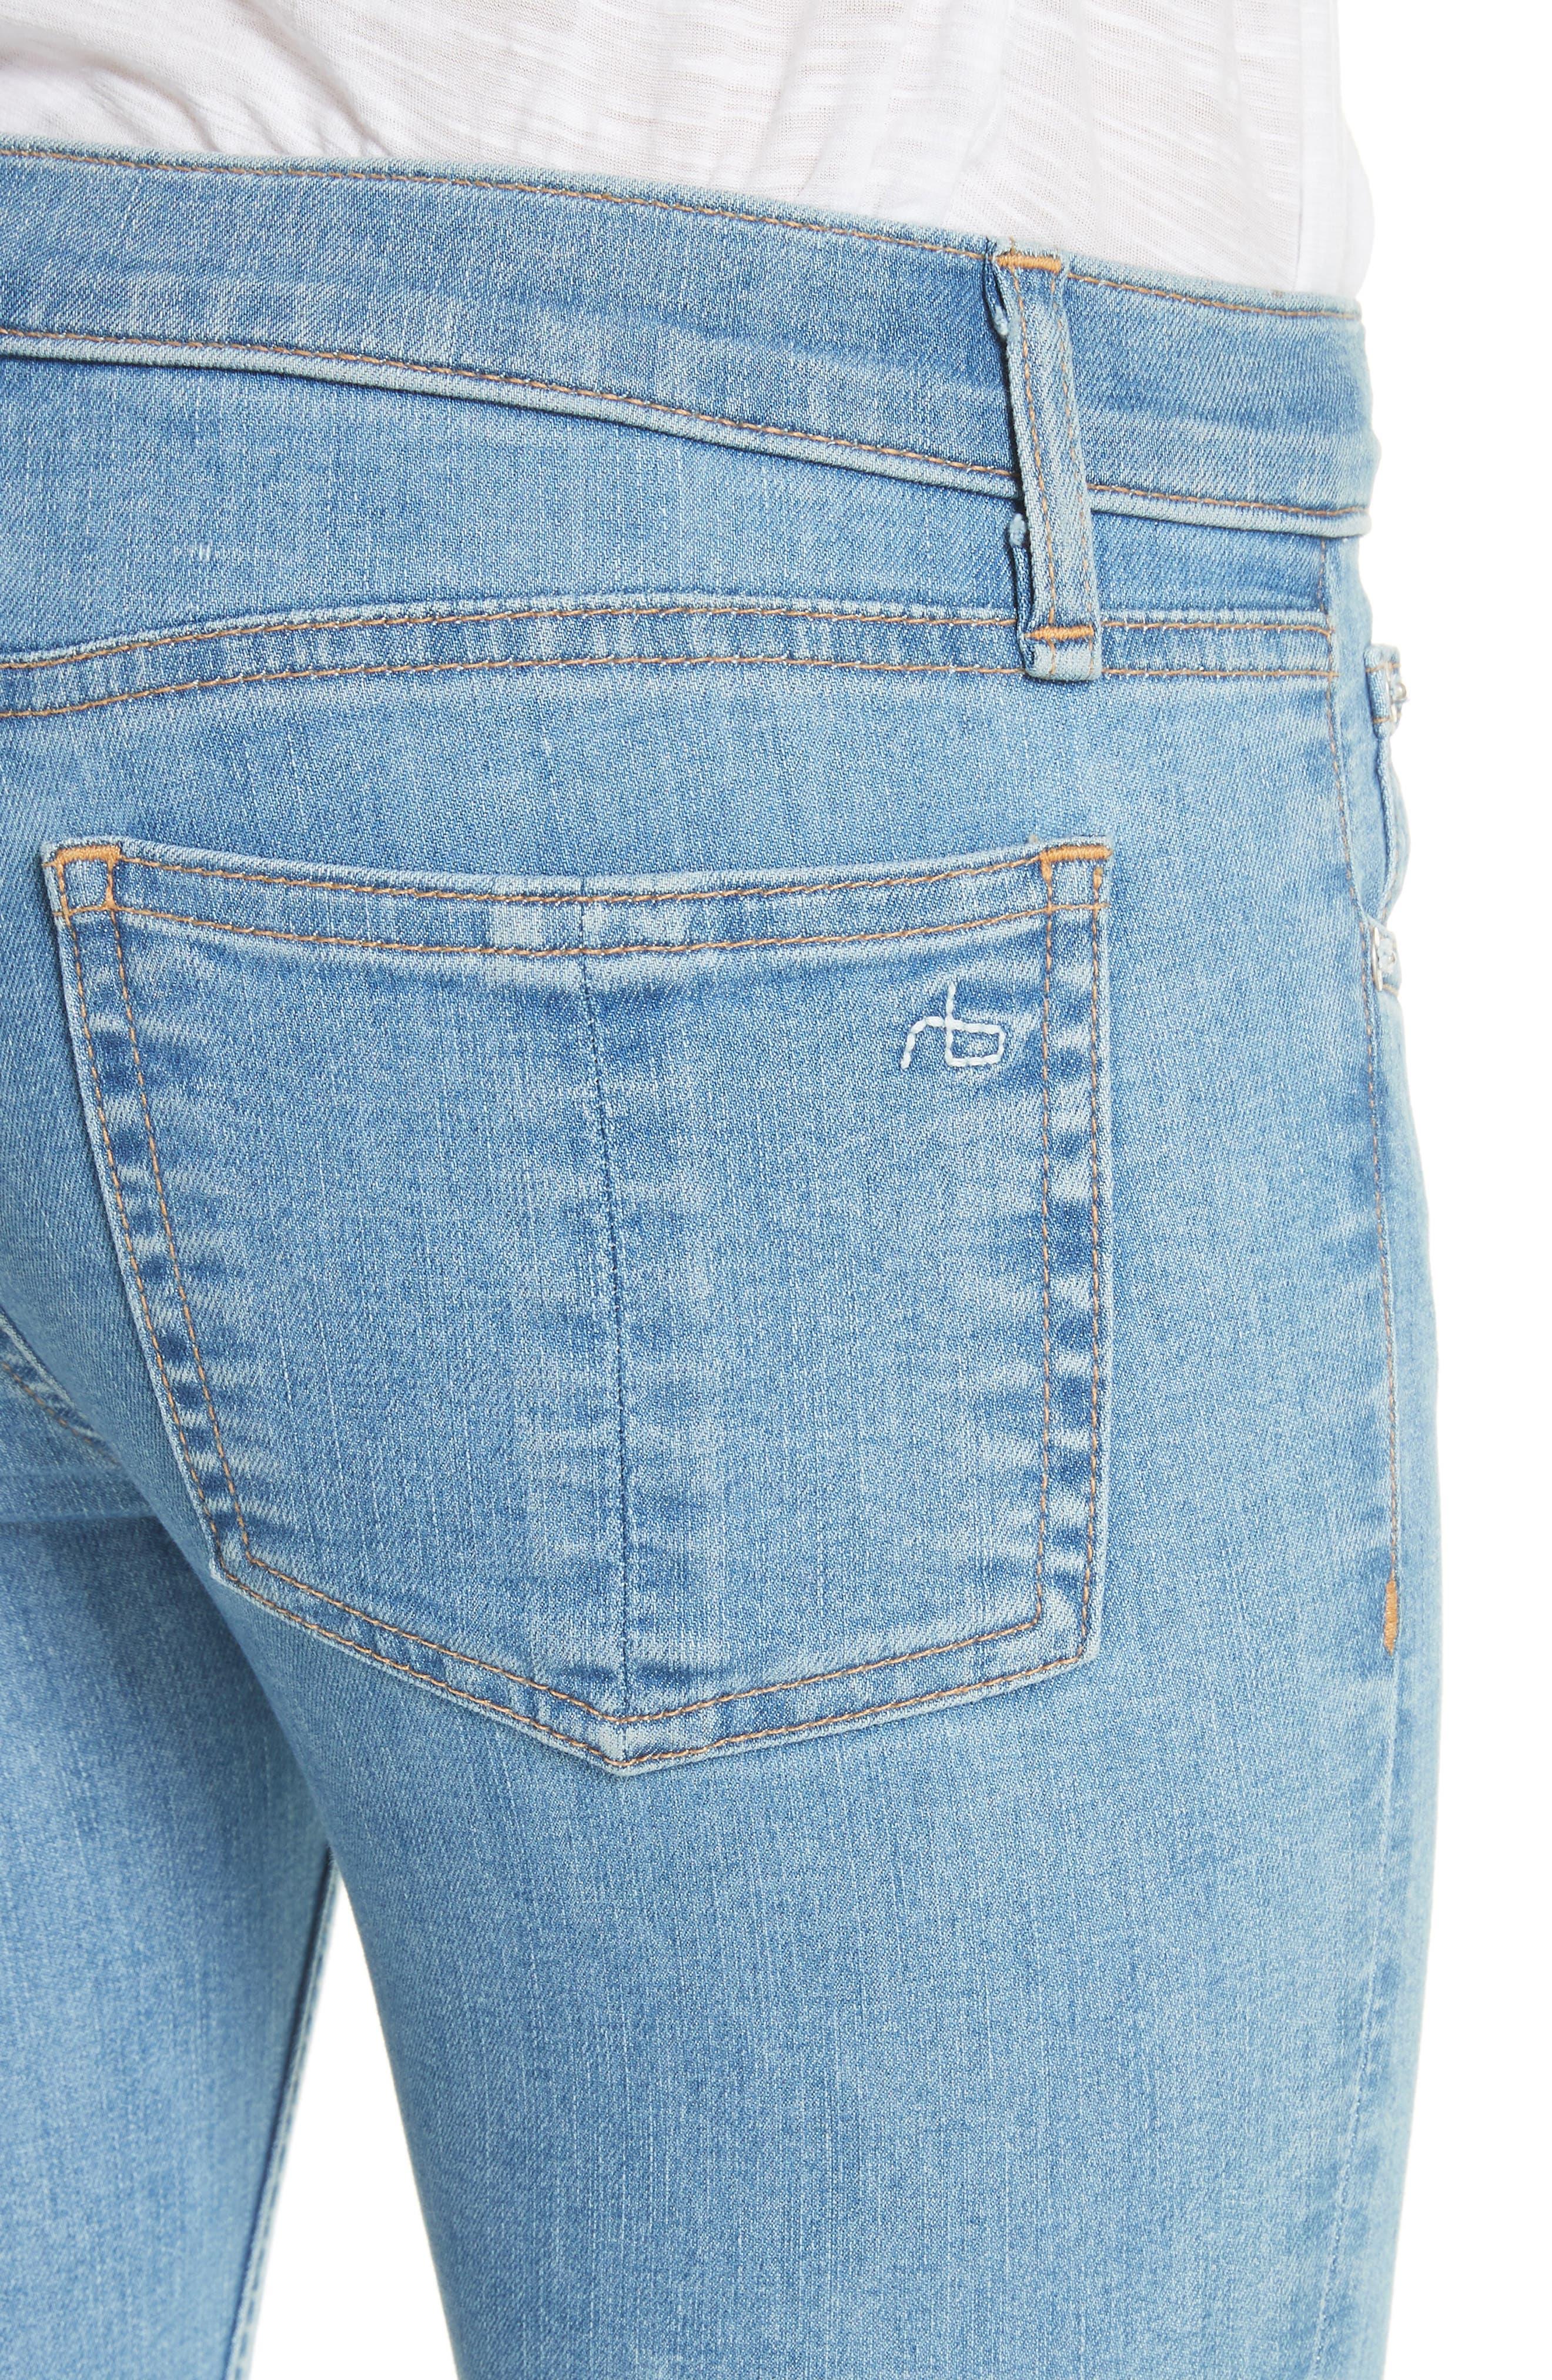 JEAN Release Hem Ankle Skinny Jeans,                             Alternate thumbnail 4, color,                             409